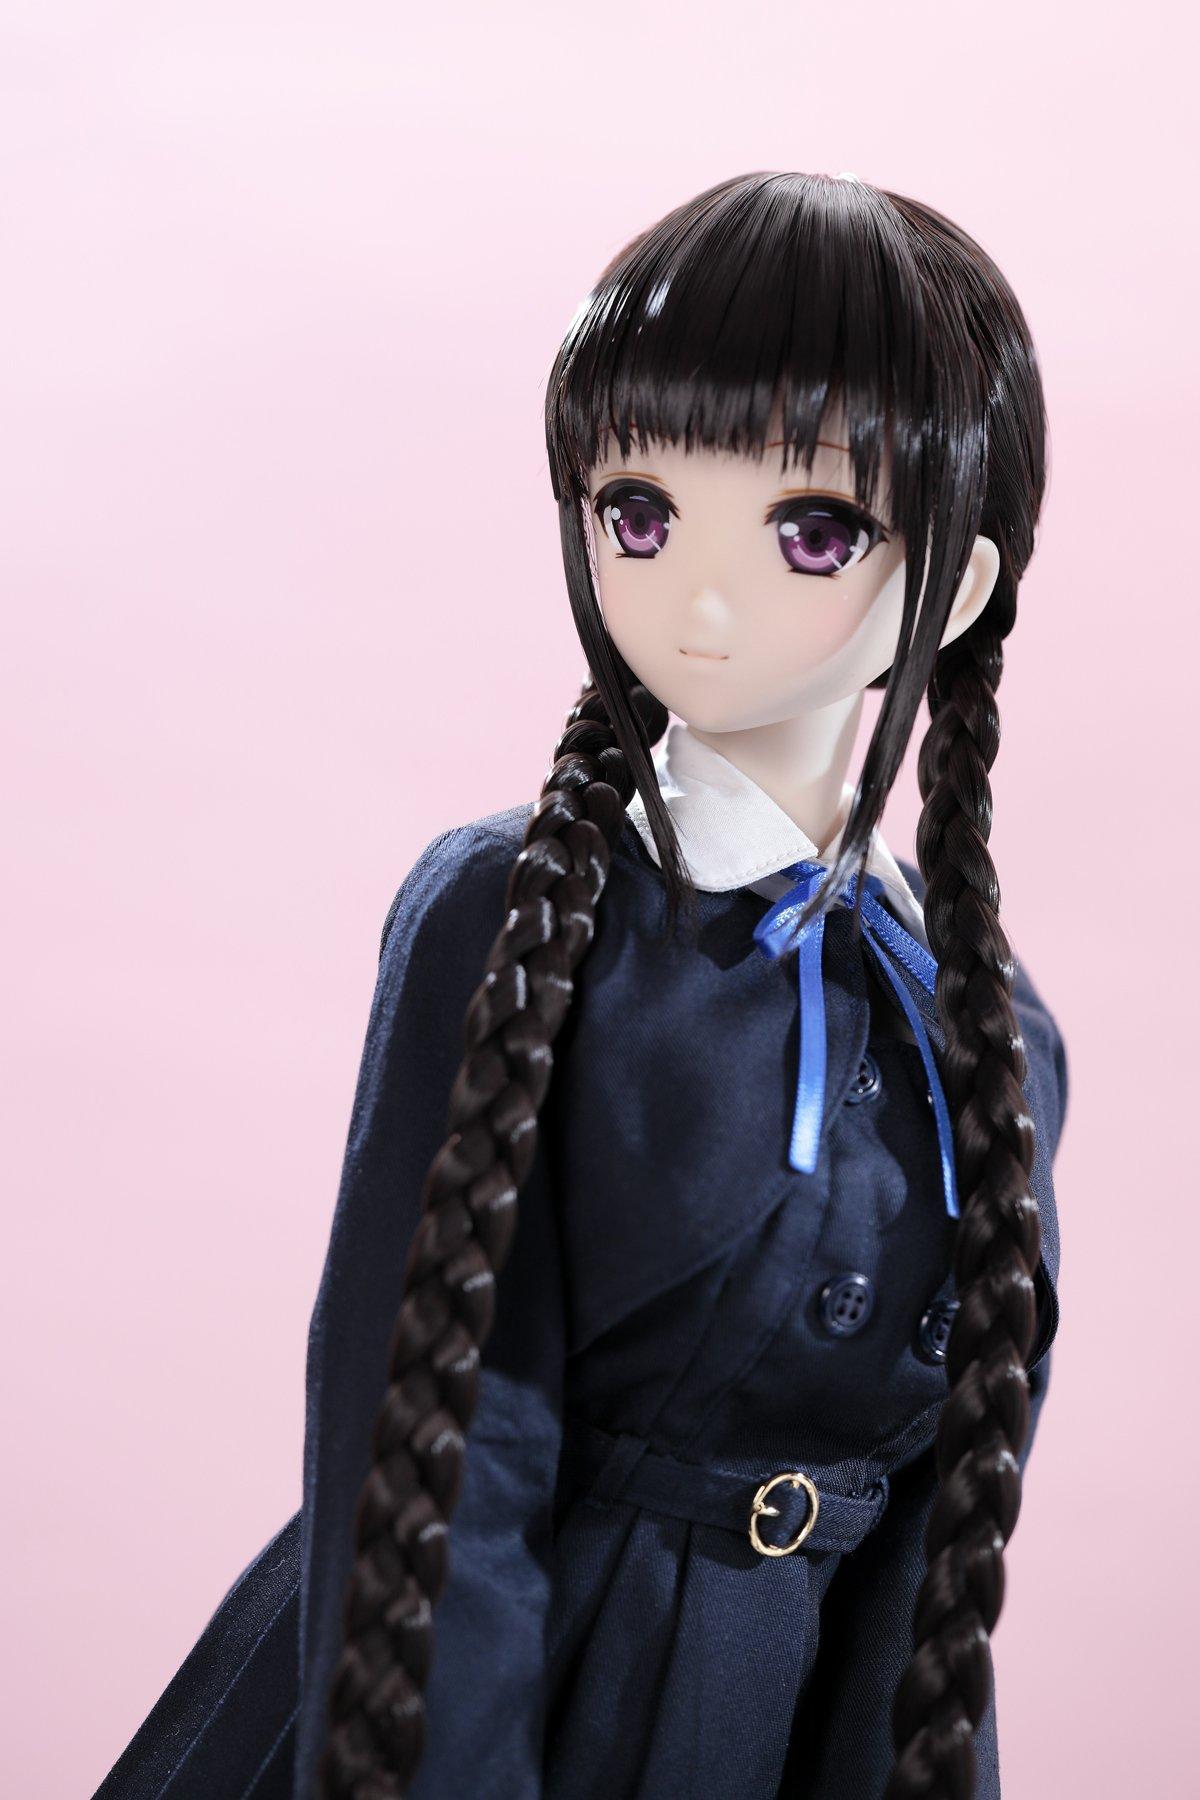 [Azone] 1/3 Happiness Clover - Yukari - Kazuharu Kina School Uniform Collection  Img_2079